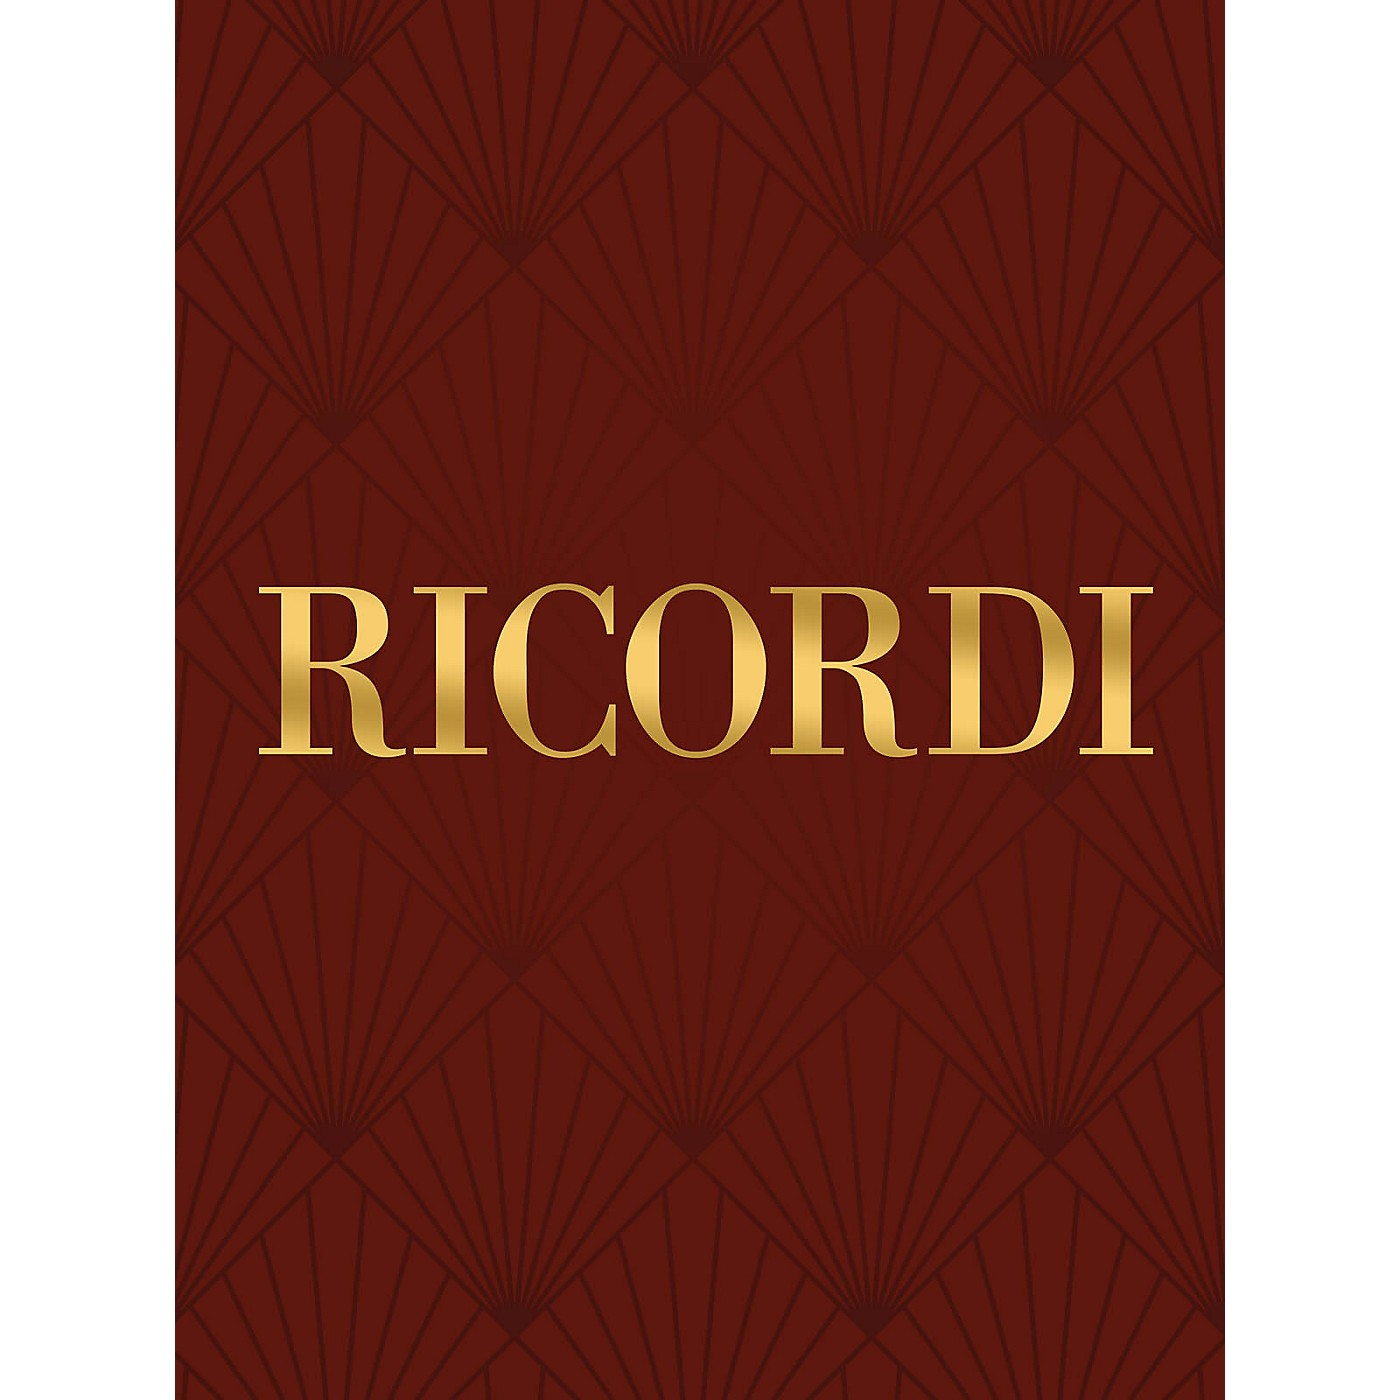 Ricordi Il Mio Primo Schubert (My First Schubert) - Vol 2 Piano Collection by Schubert Edited by Piero Rattalino thumbnail